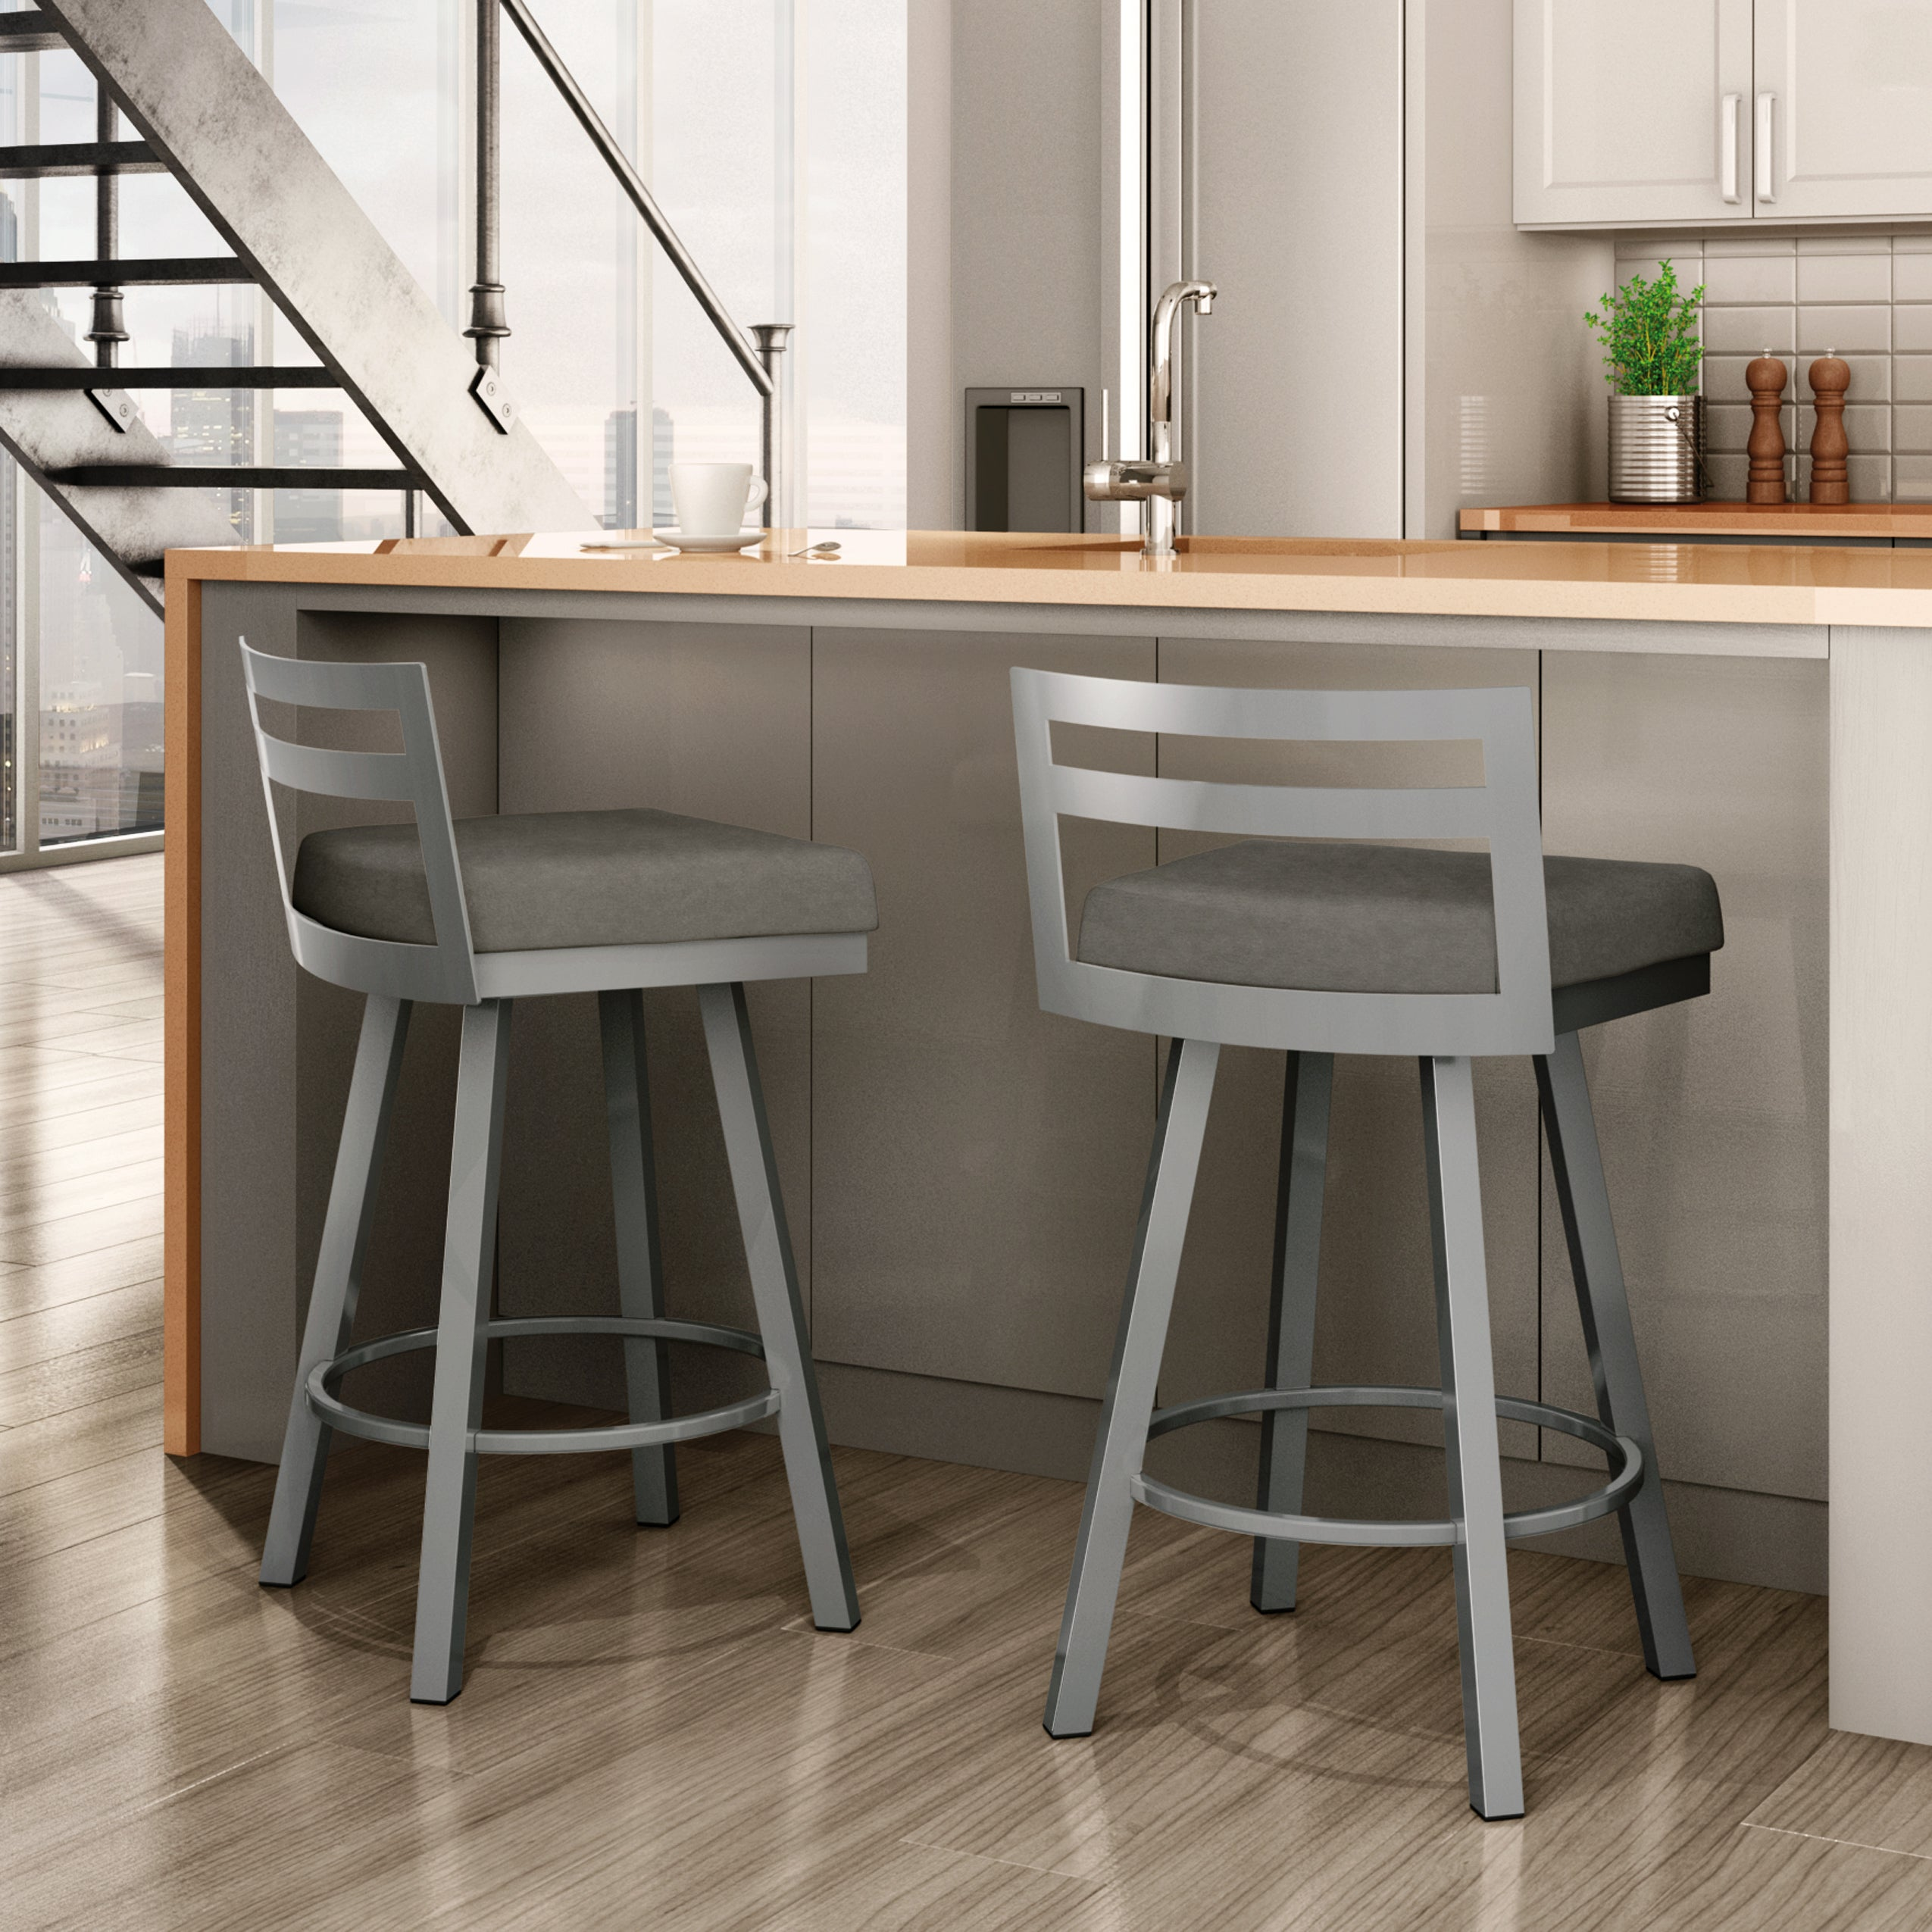 Pleasing Strick Bolton Hudson 30 Inch Bar Stool Swivel Metal Ibusinesslaw Wood Chair Design Ideas Ibusinesslaworg